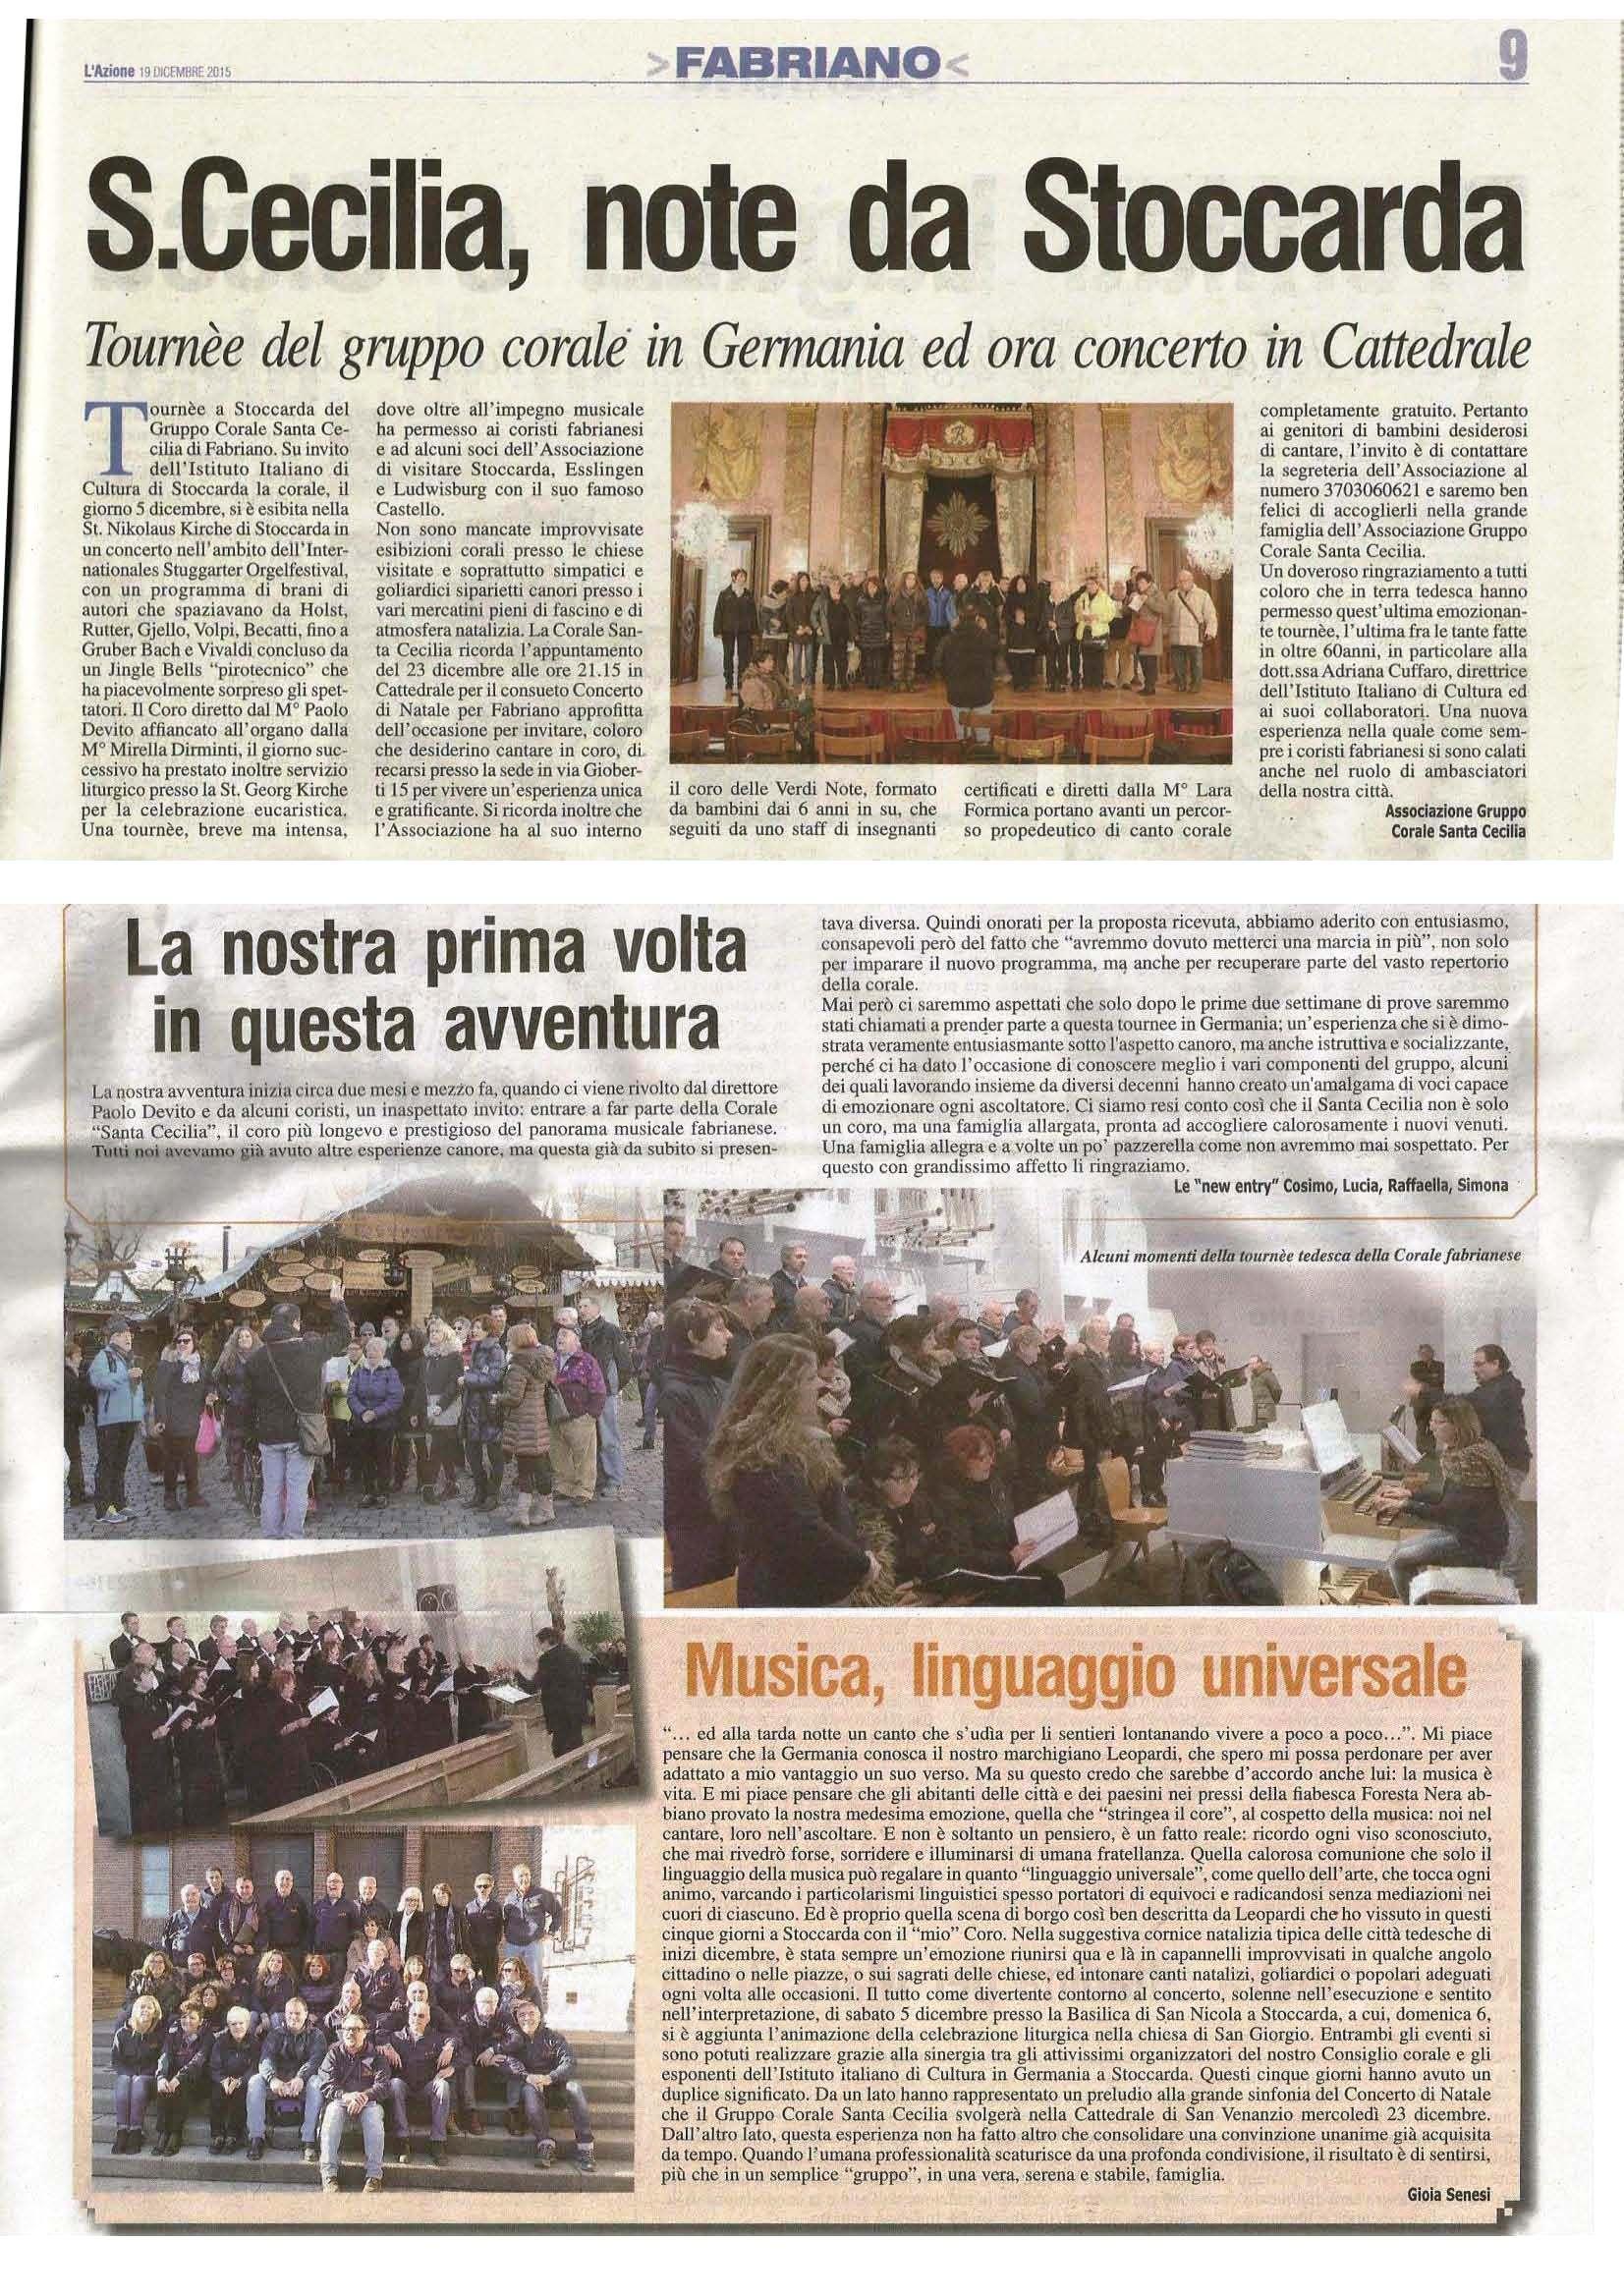 Pagina da L'Azione